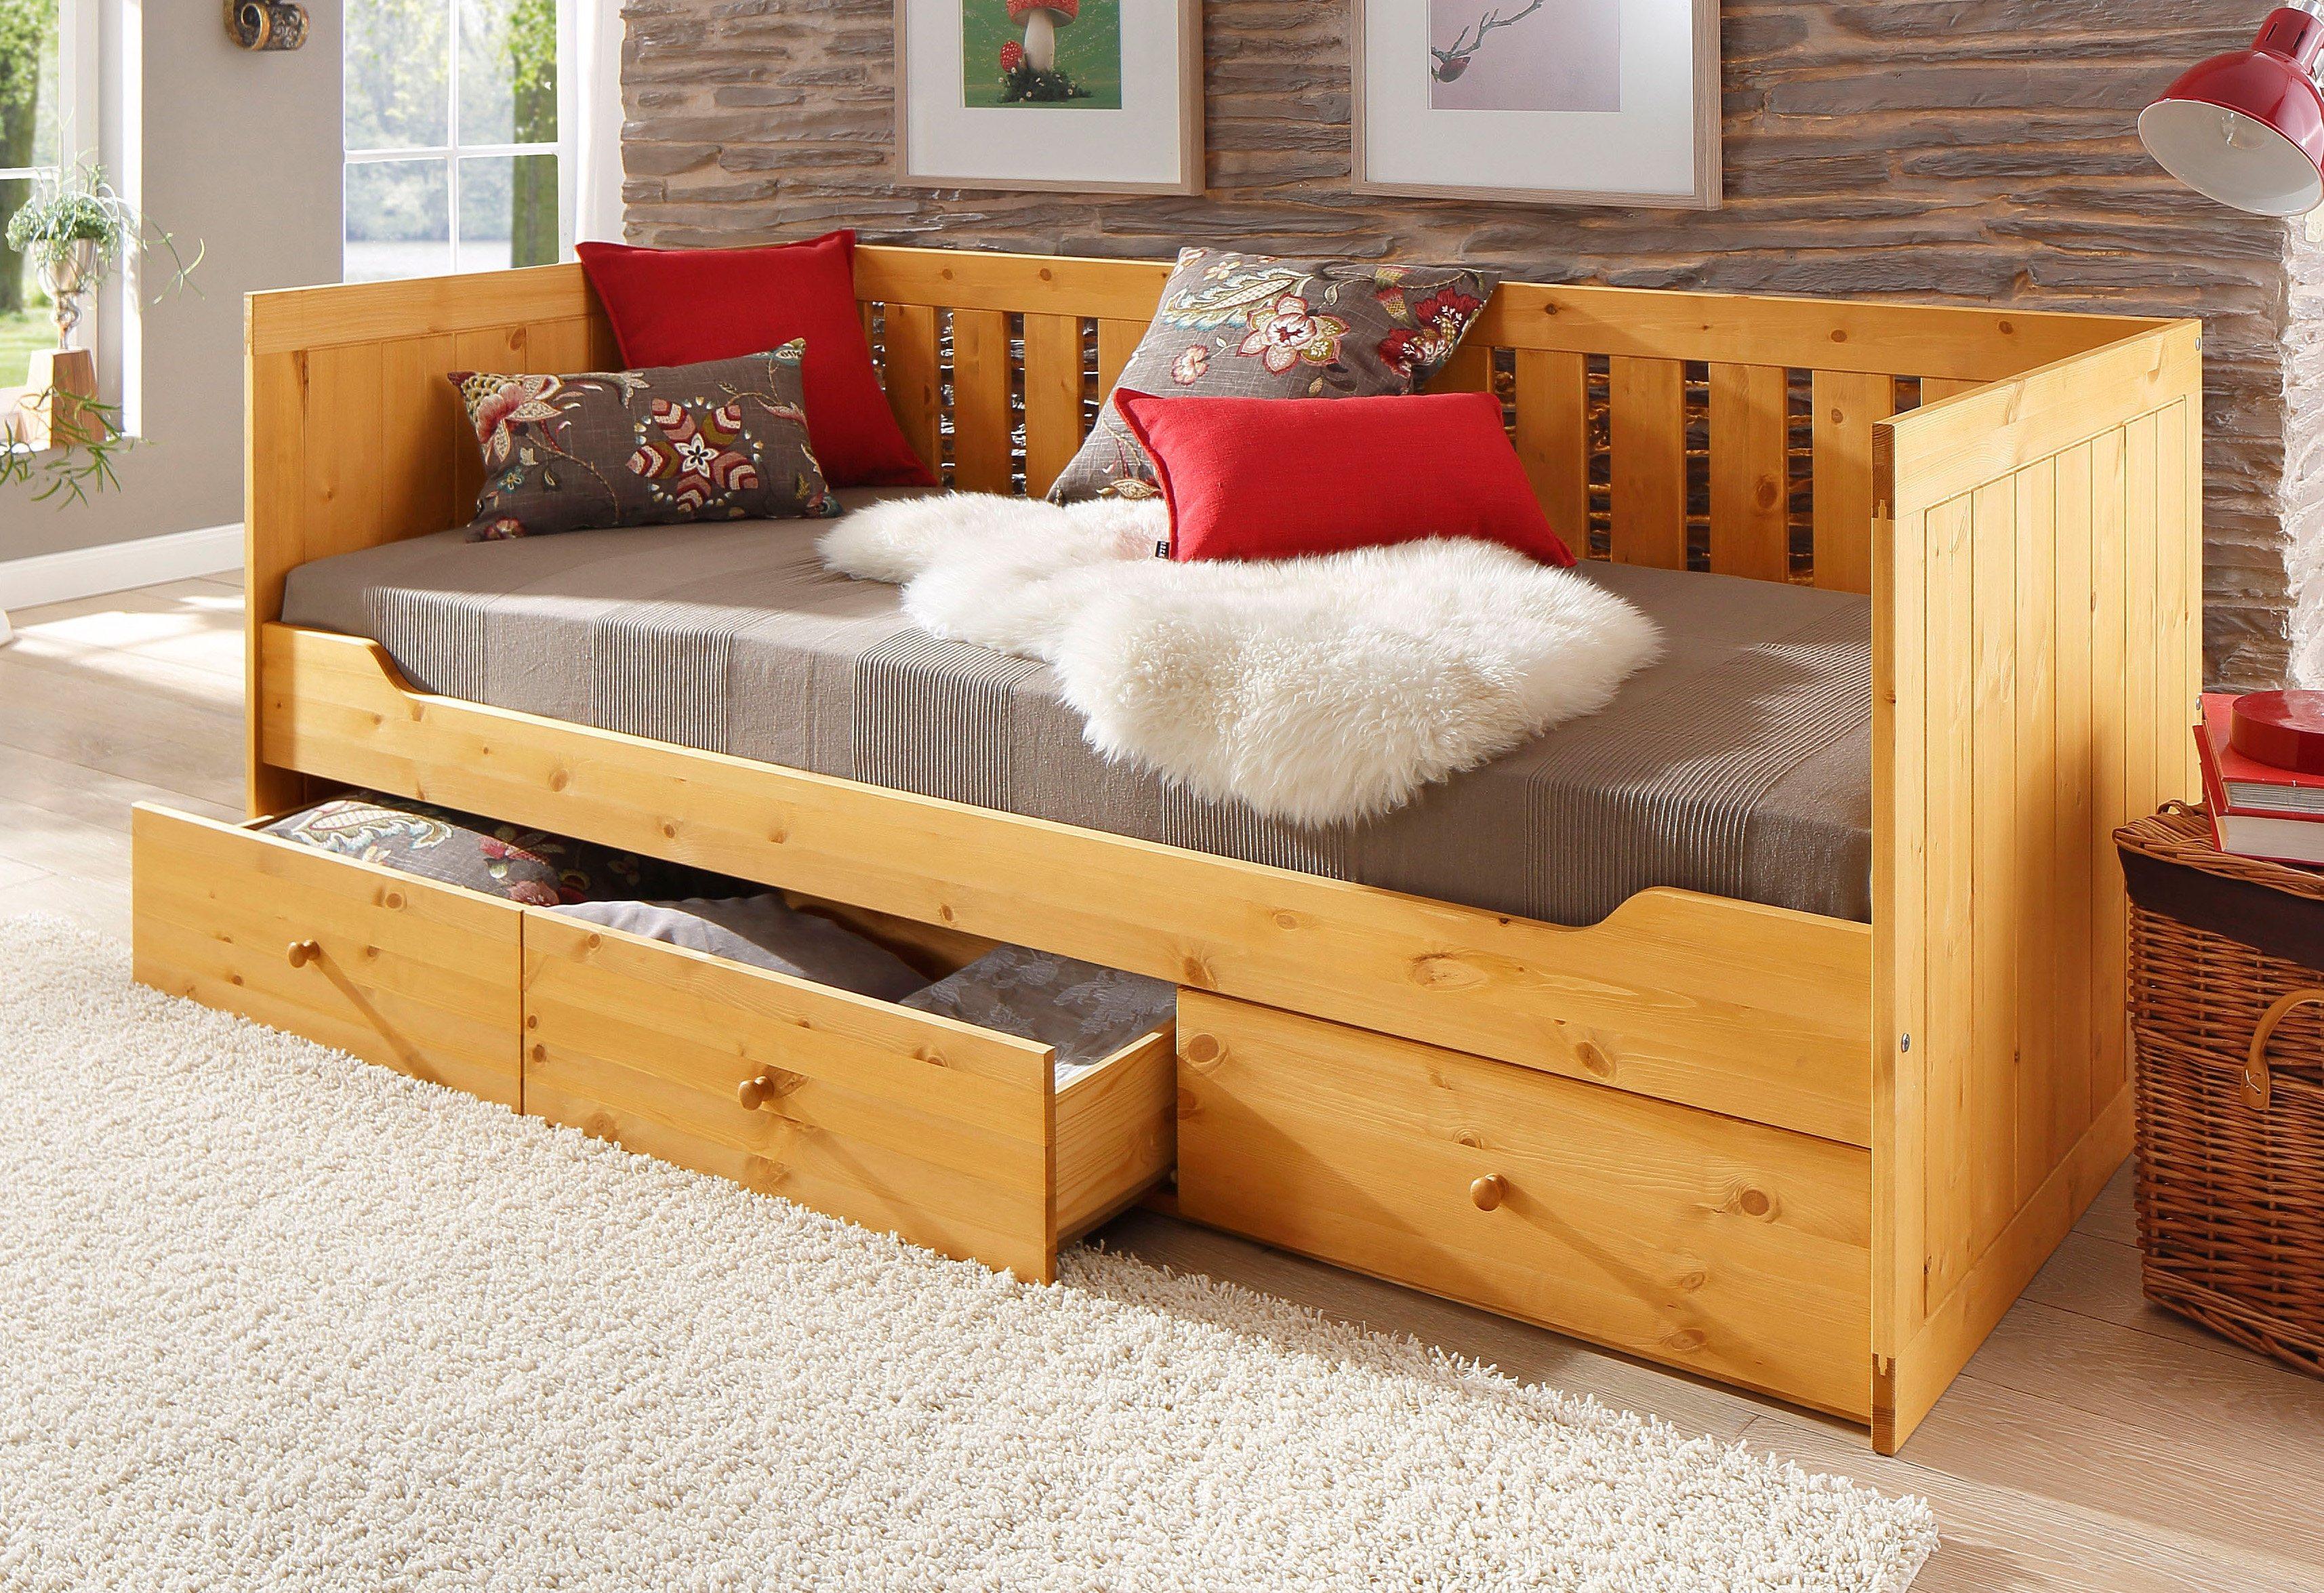 14 sparen home affaire daybett sellin nur 299 99 cherry m bel otto. Black Bedroom Furniture Sets. Home Design Ideas